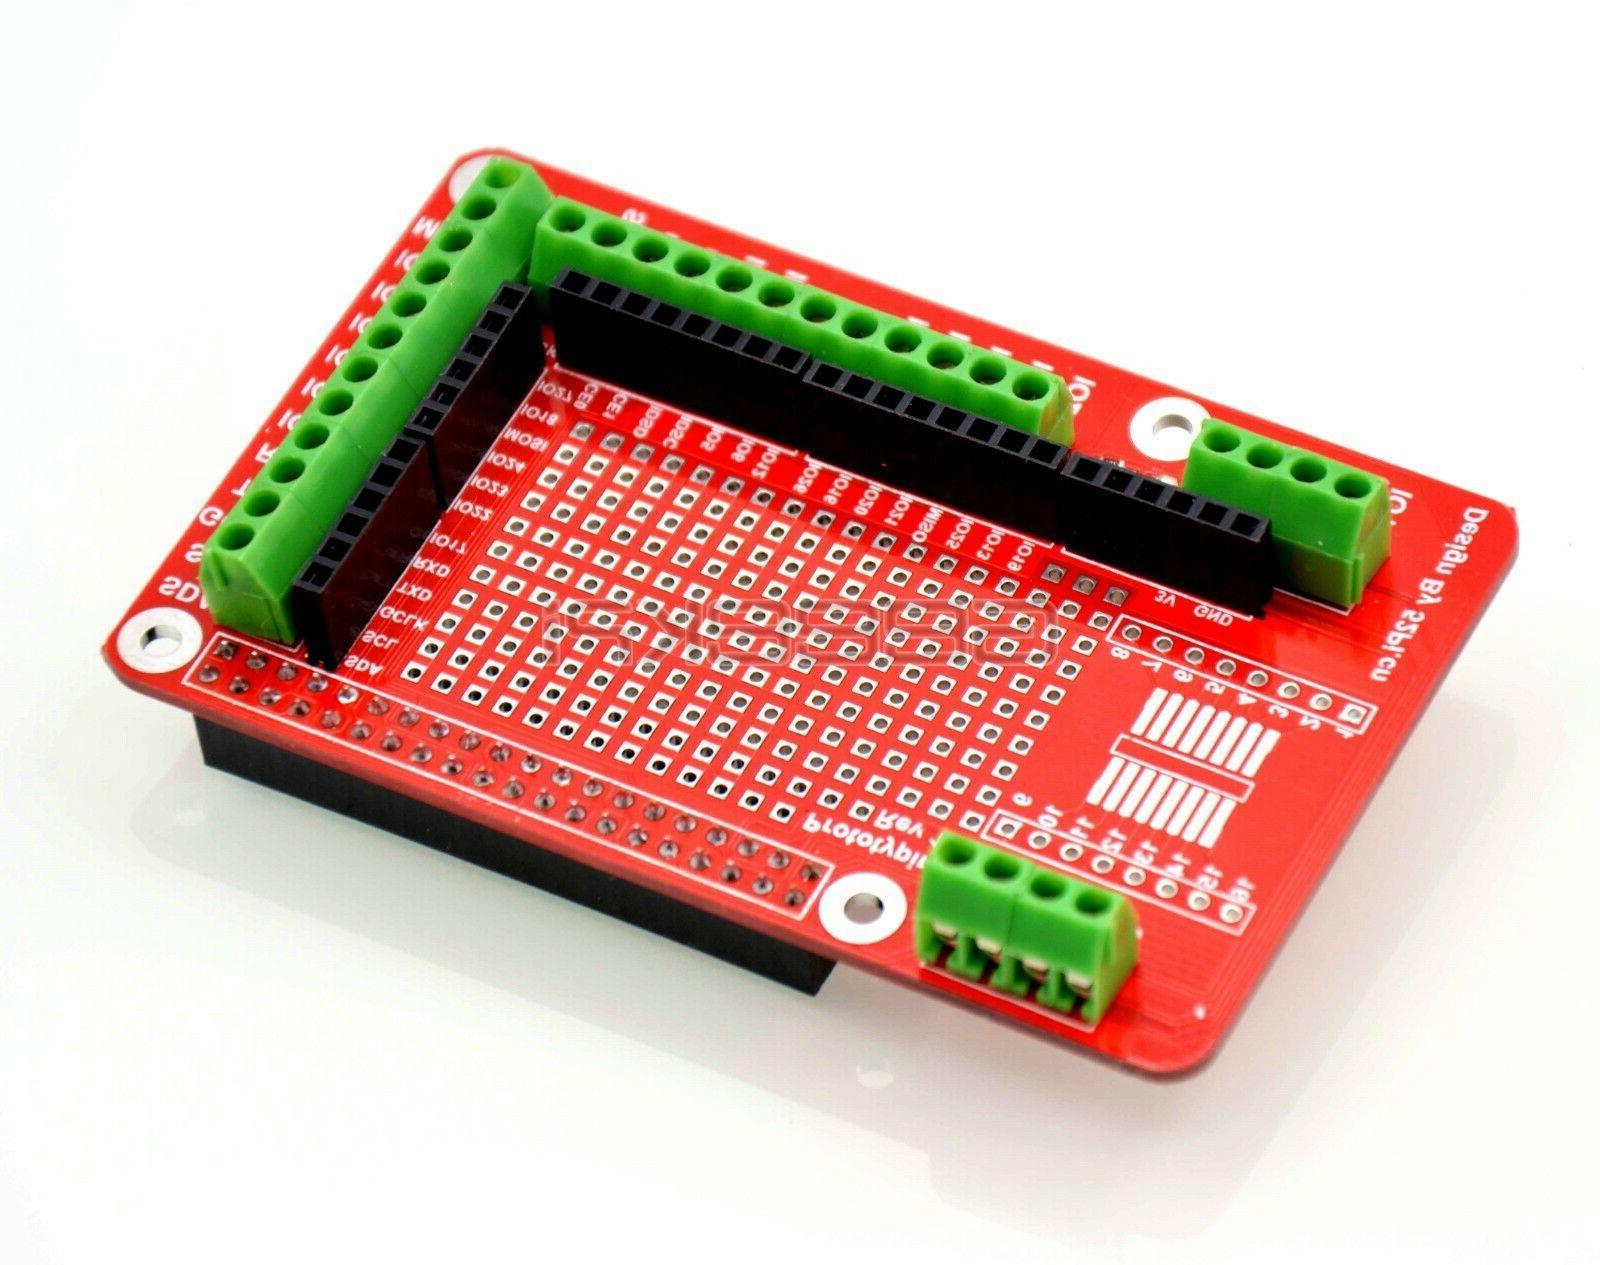 Raspberry / 3B prototype Pi board Pi